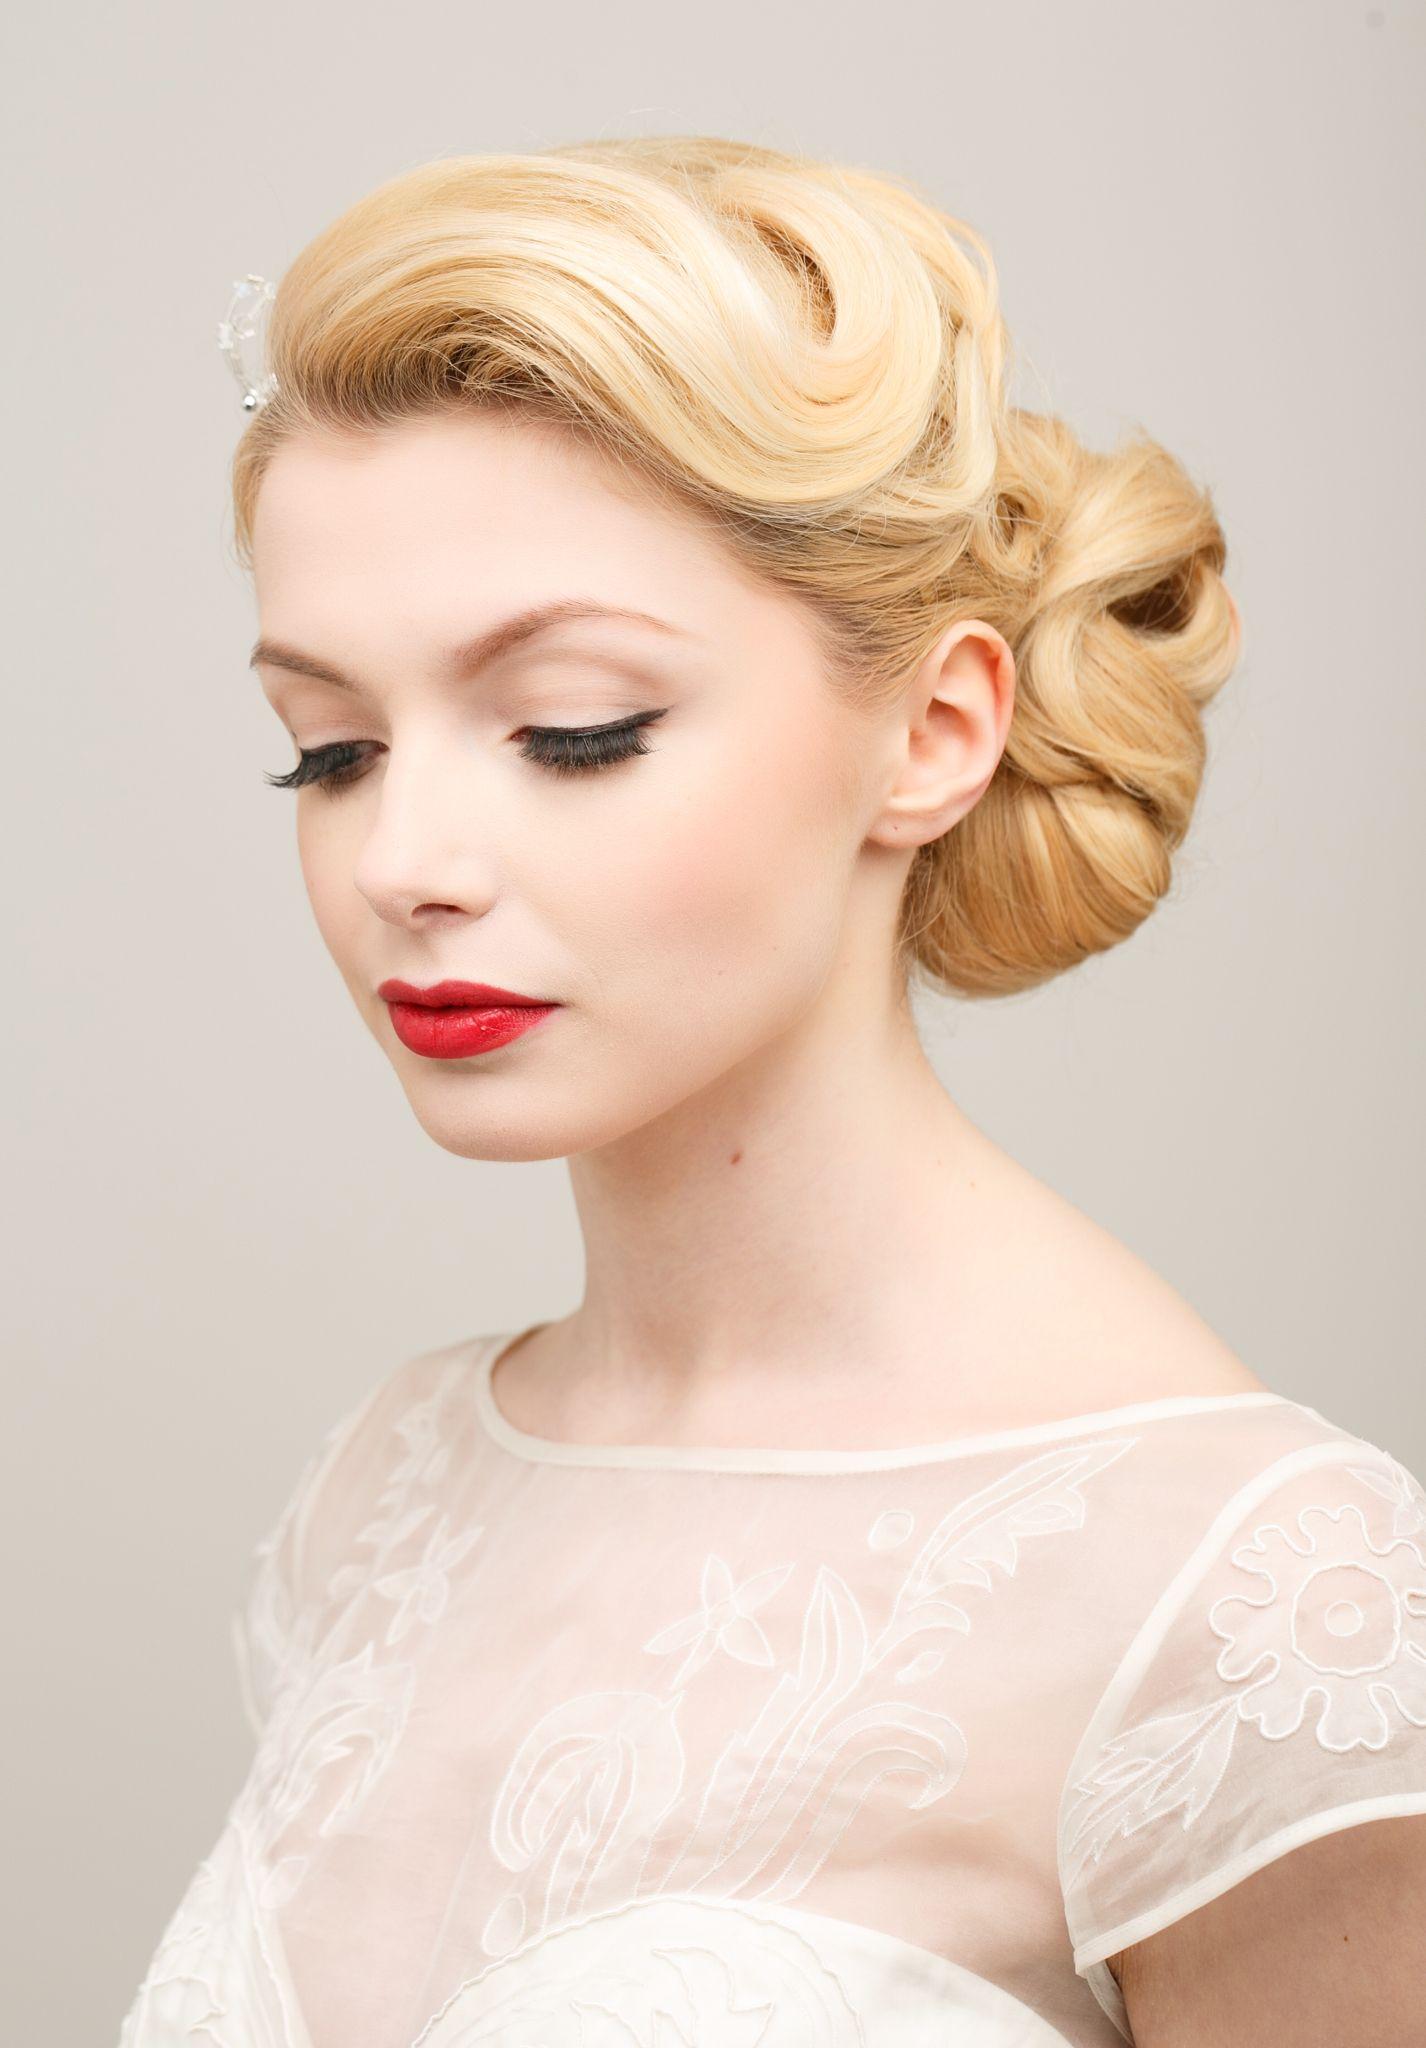 Bridal Hair And Makeup Vintage Style Updo Red Lip Natural Makeup Vintage Wedding Hair Retro Wedding Hair Bridal Hair And Makeup